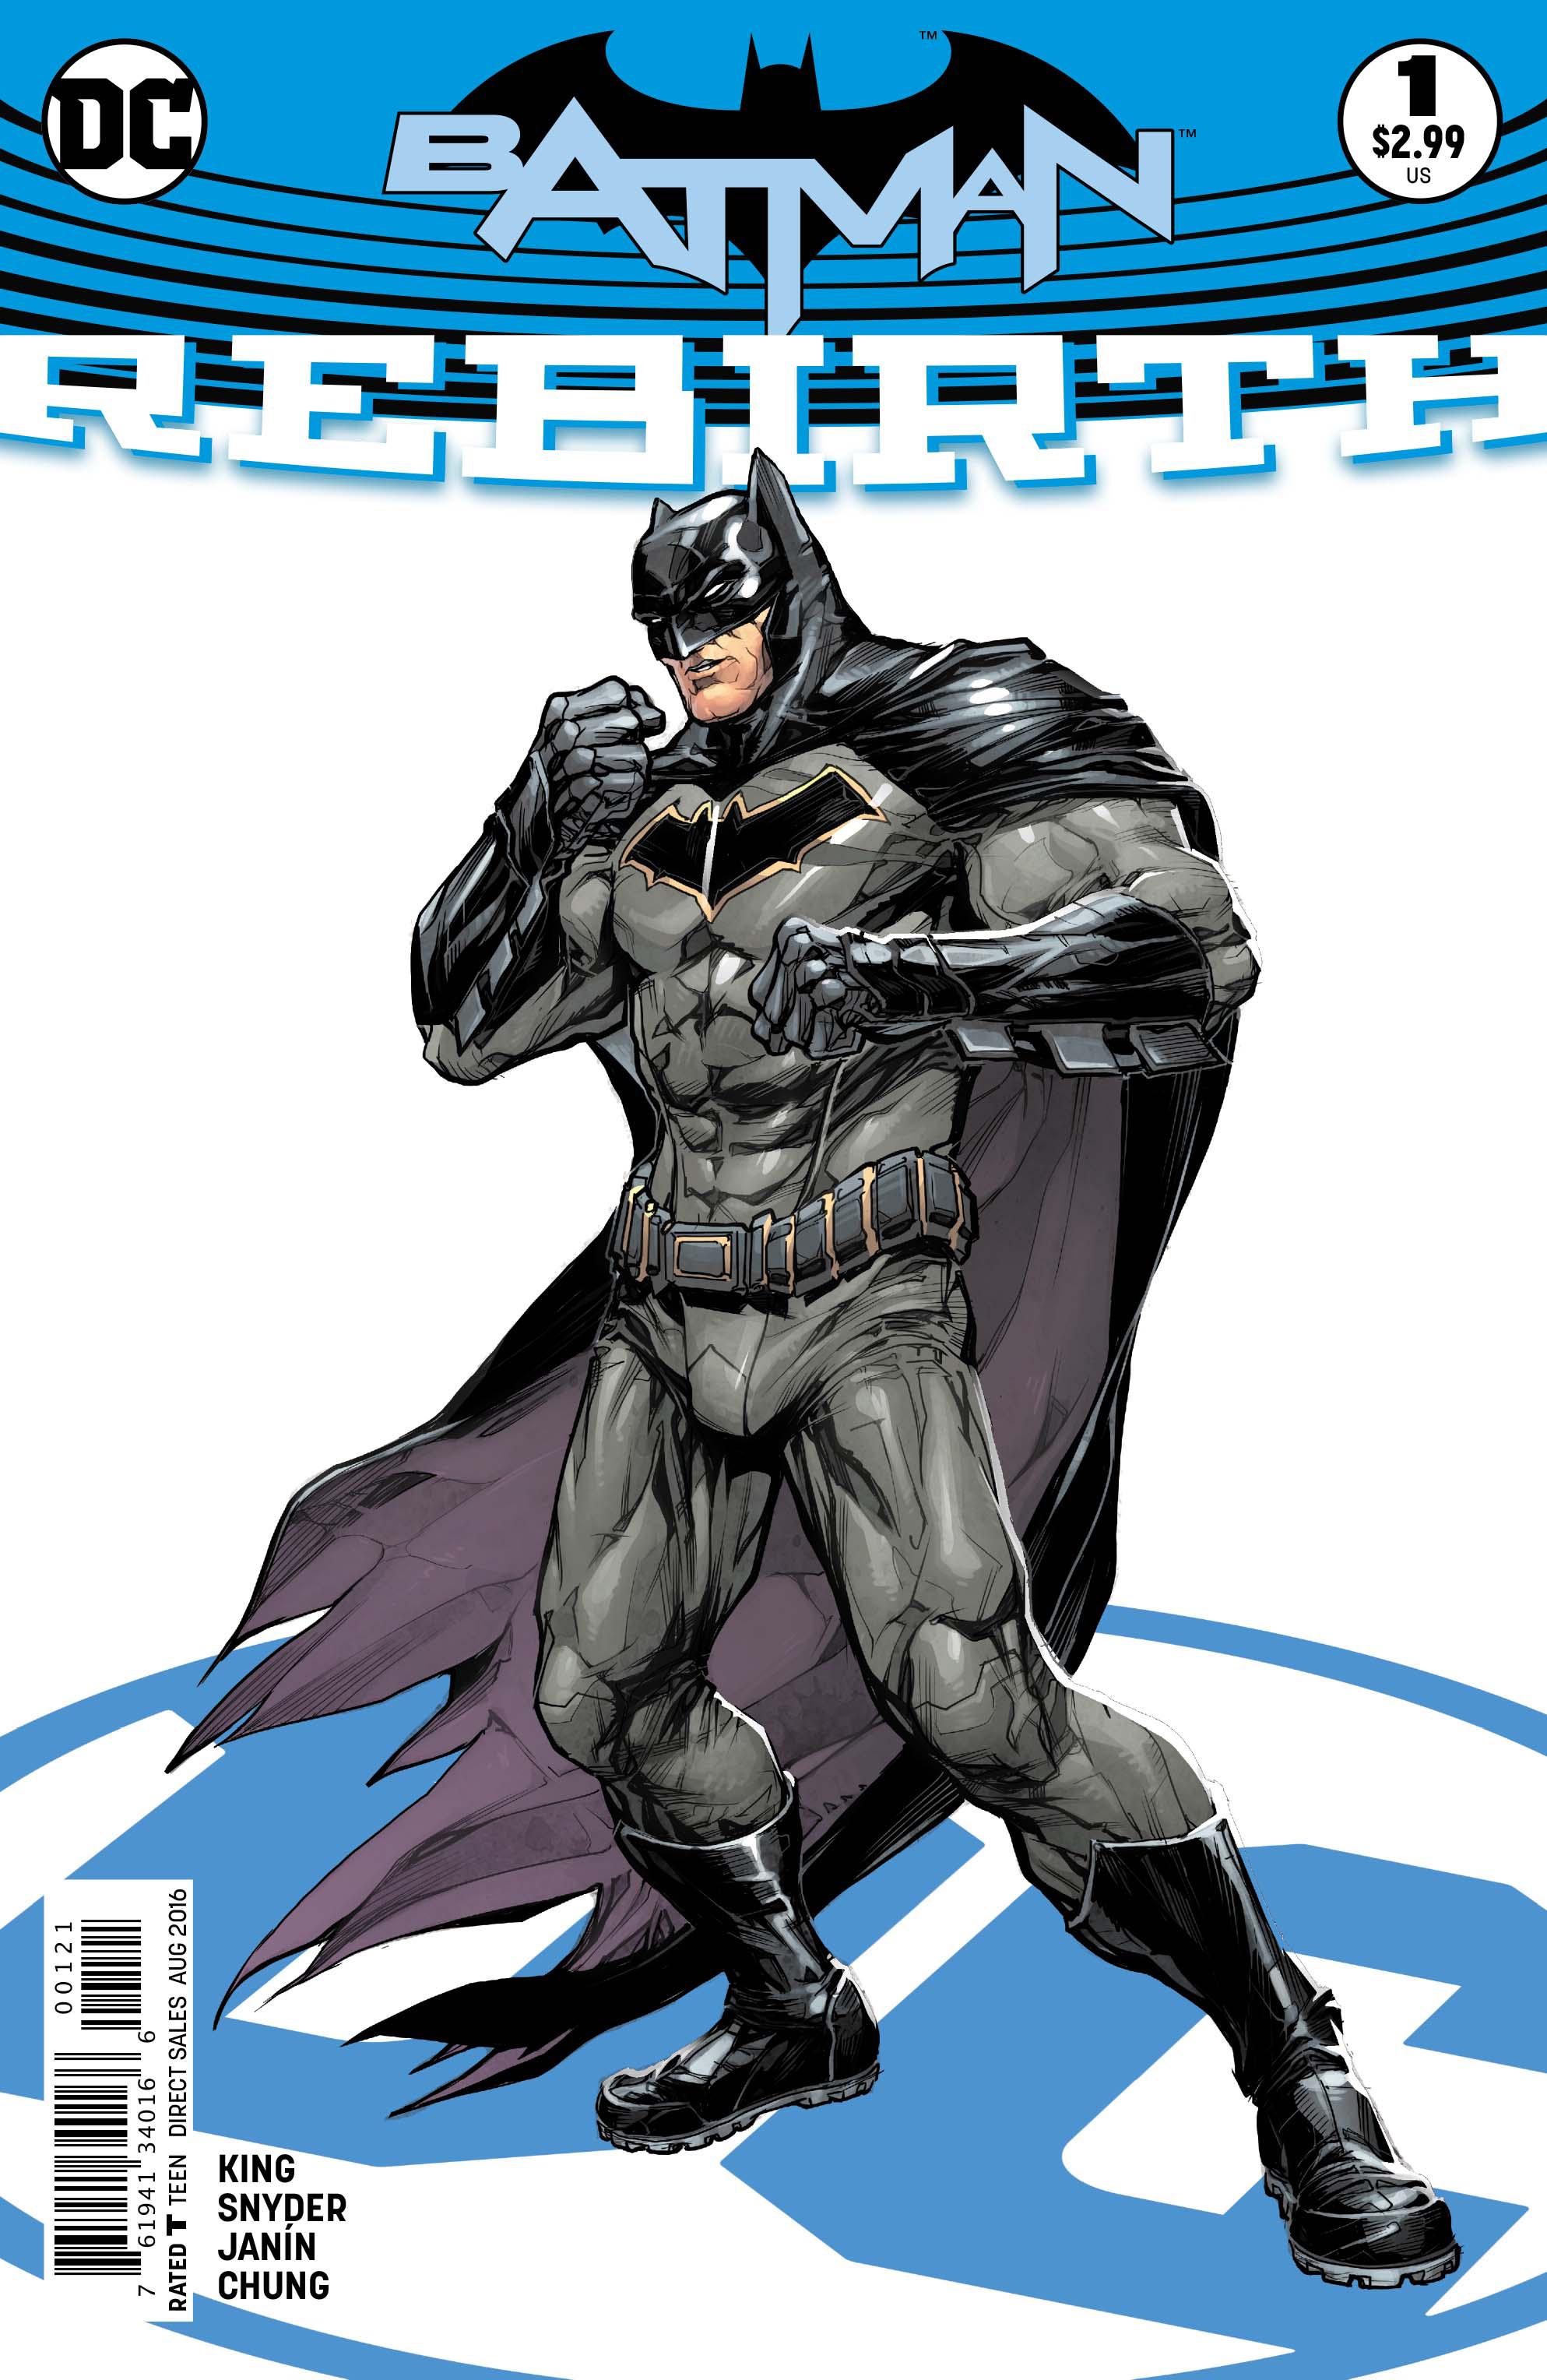 Batman Vol 3 Rebirth #1 Cover B Howard Porter Variant (REBIRTH)